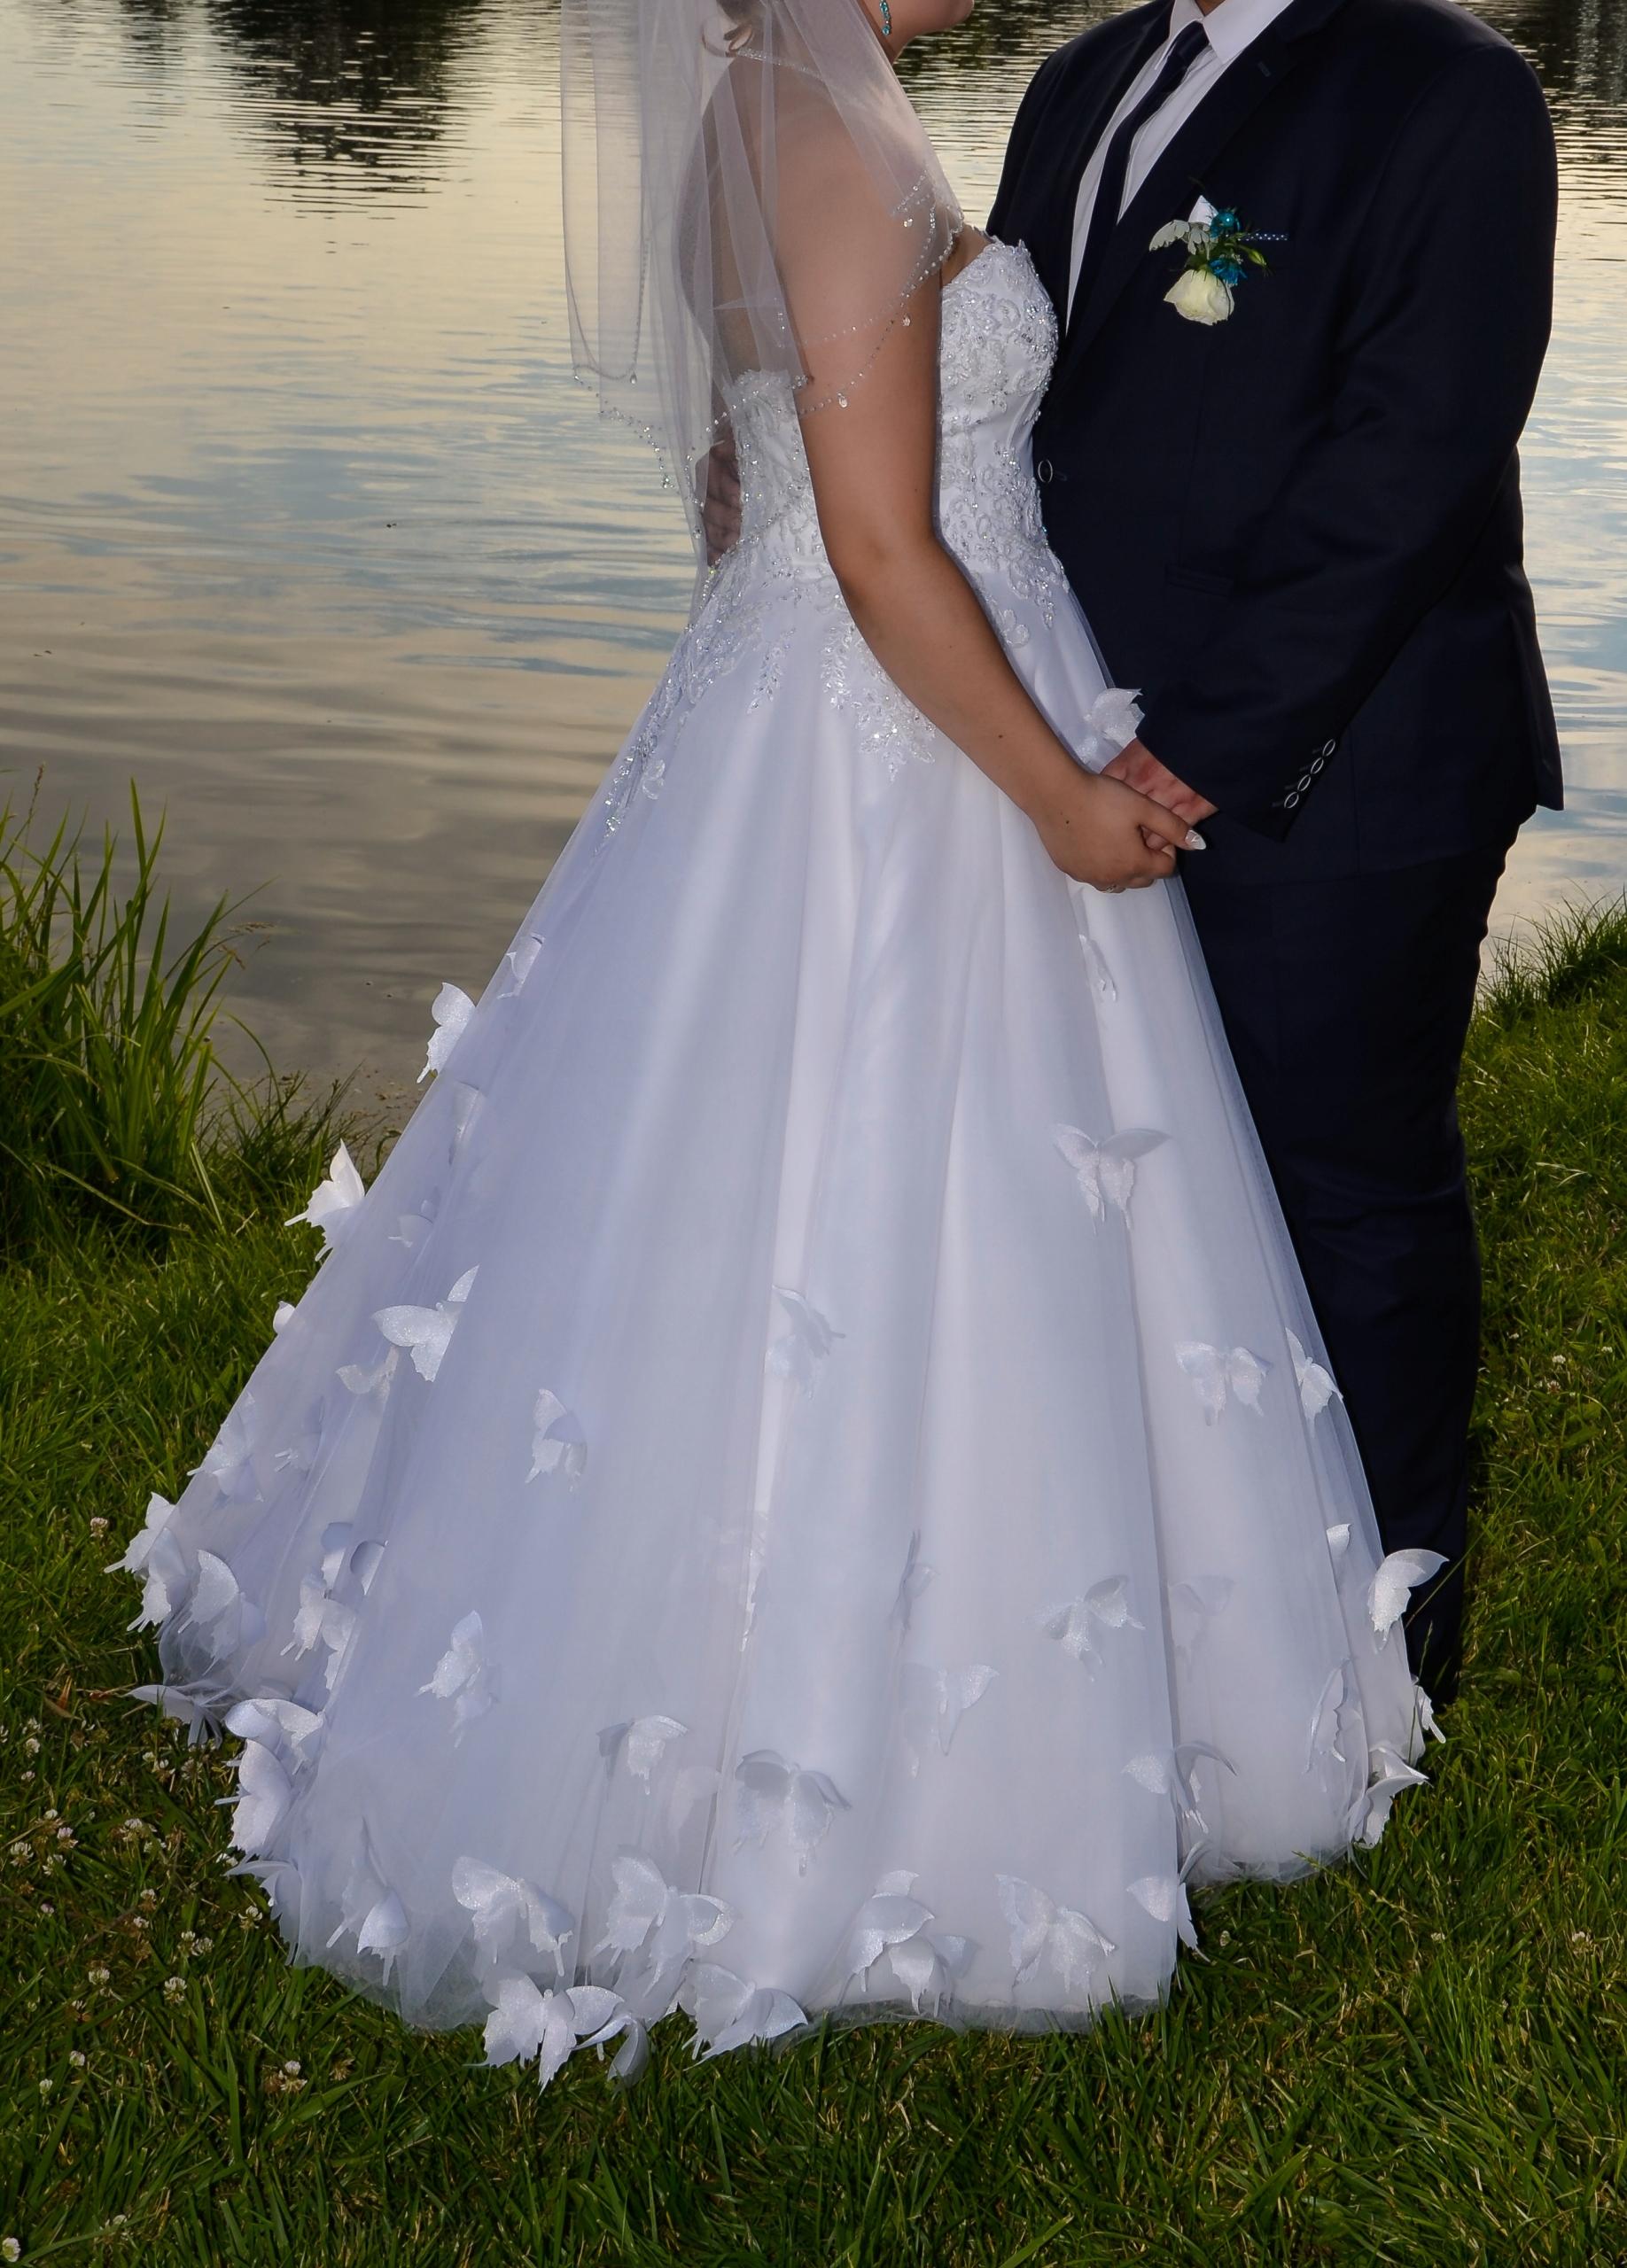 Suknia ślubna Z Motylami Natali Styran Gratis 7443957132